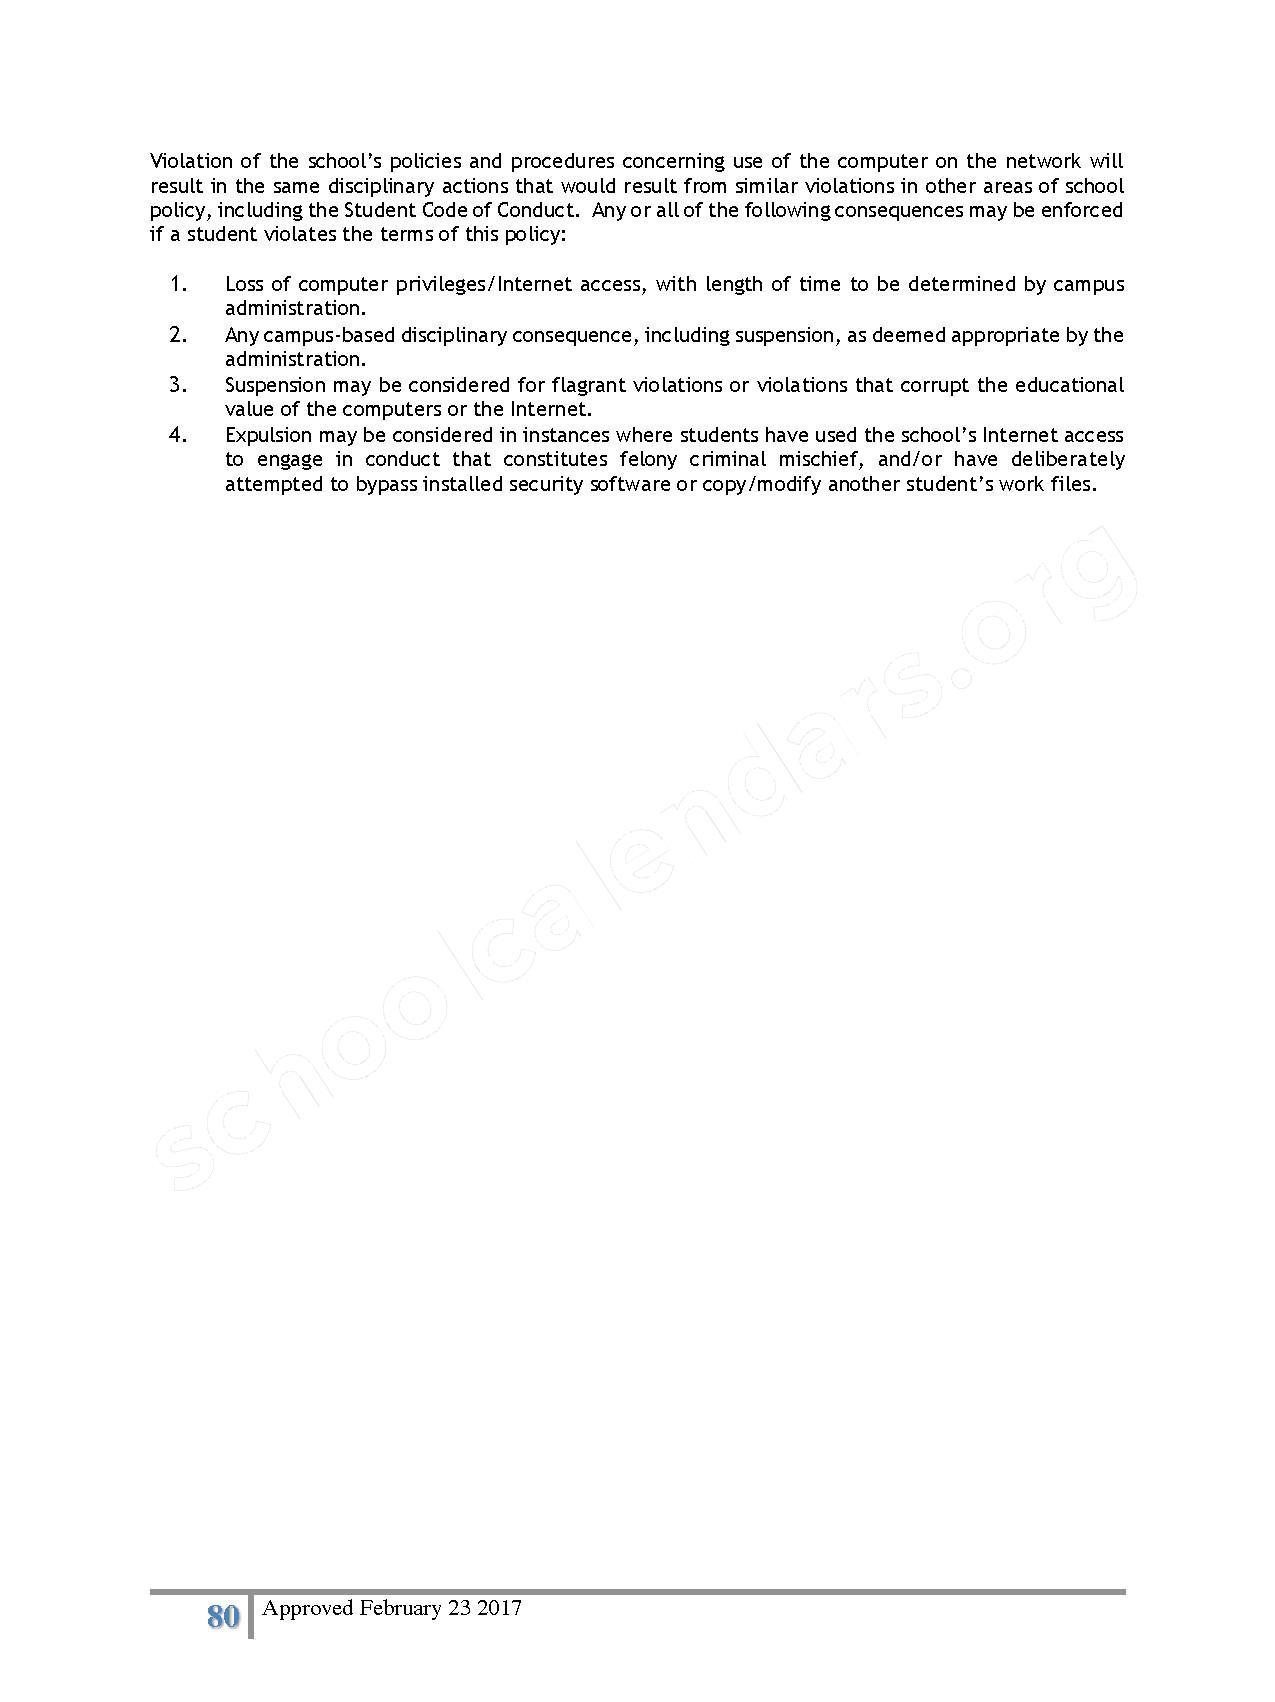 2016 - 2017 District Calendar – Lisa Academy Public Charter Schools – page 80